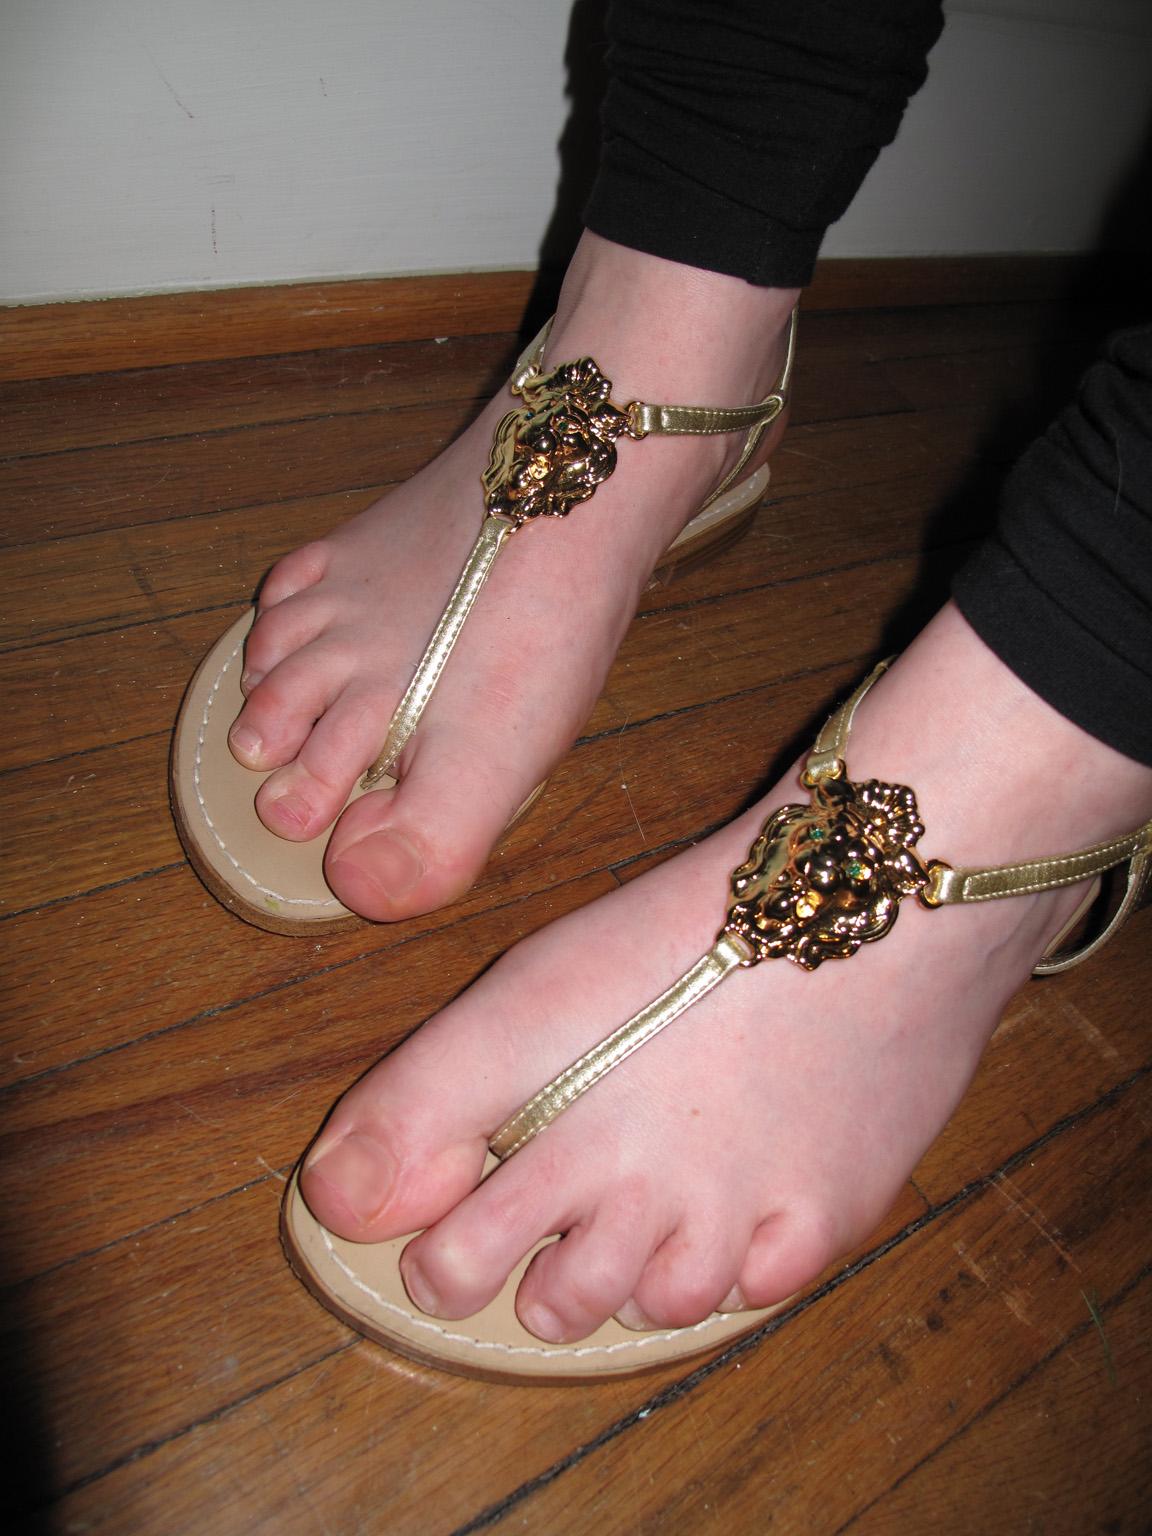 Sexy feet blog